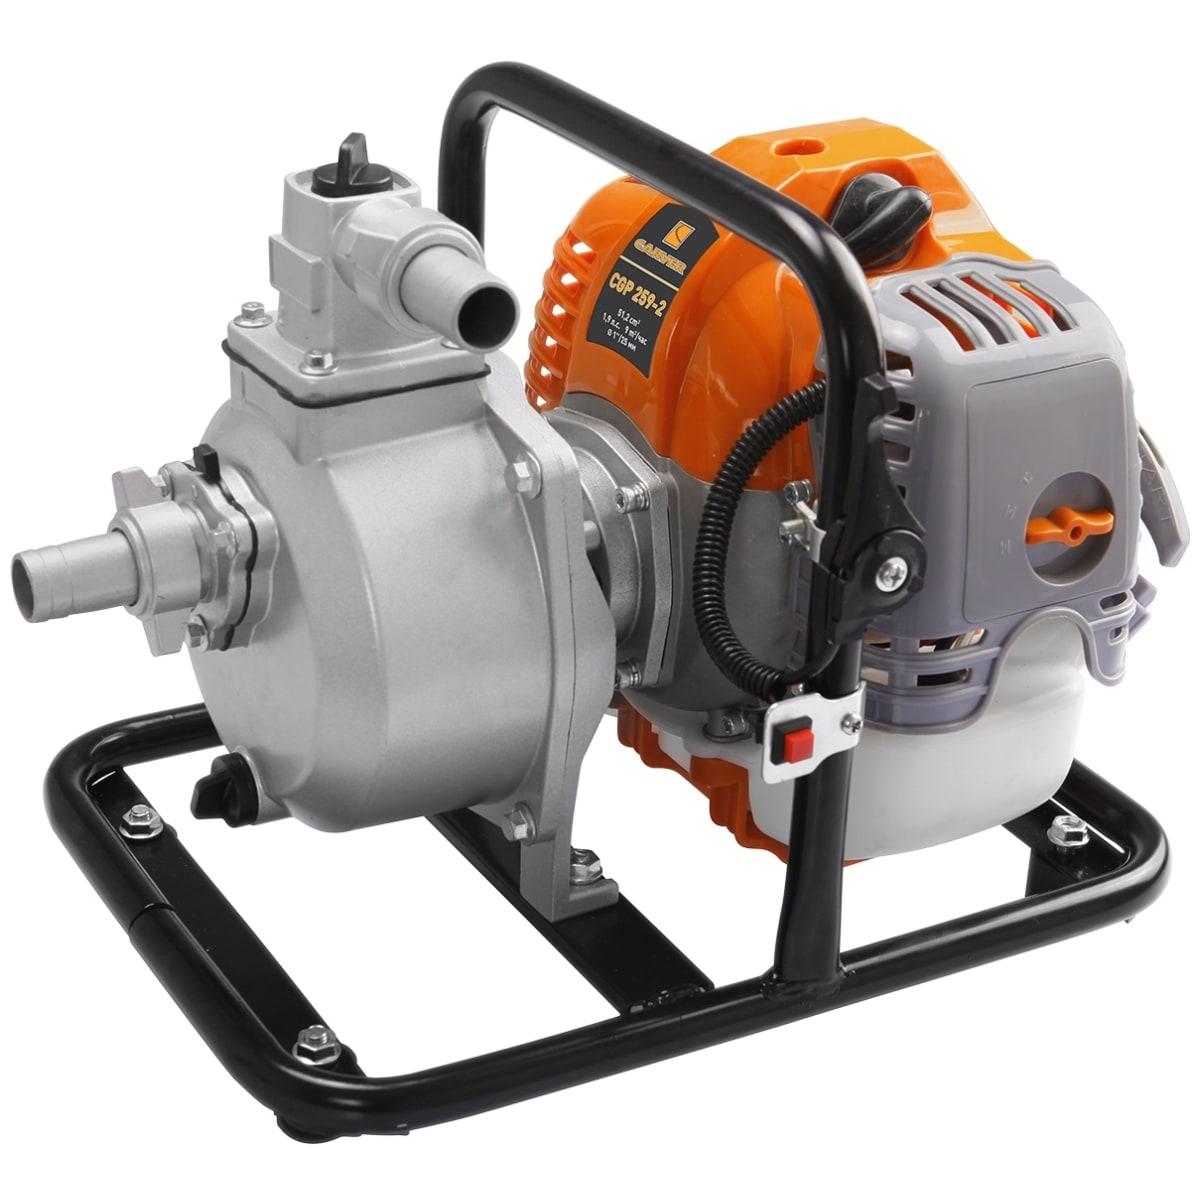 Мотопомпа Carver 2T CGP 259-2, 9000 л/час